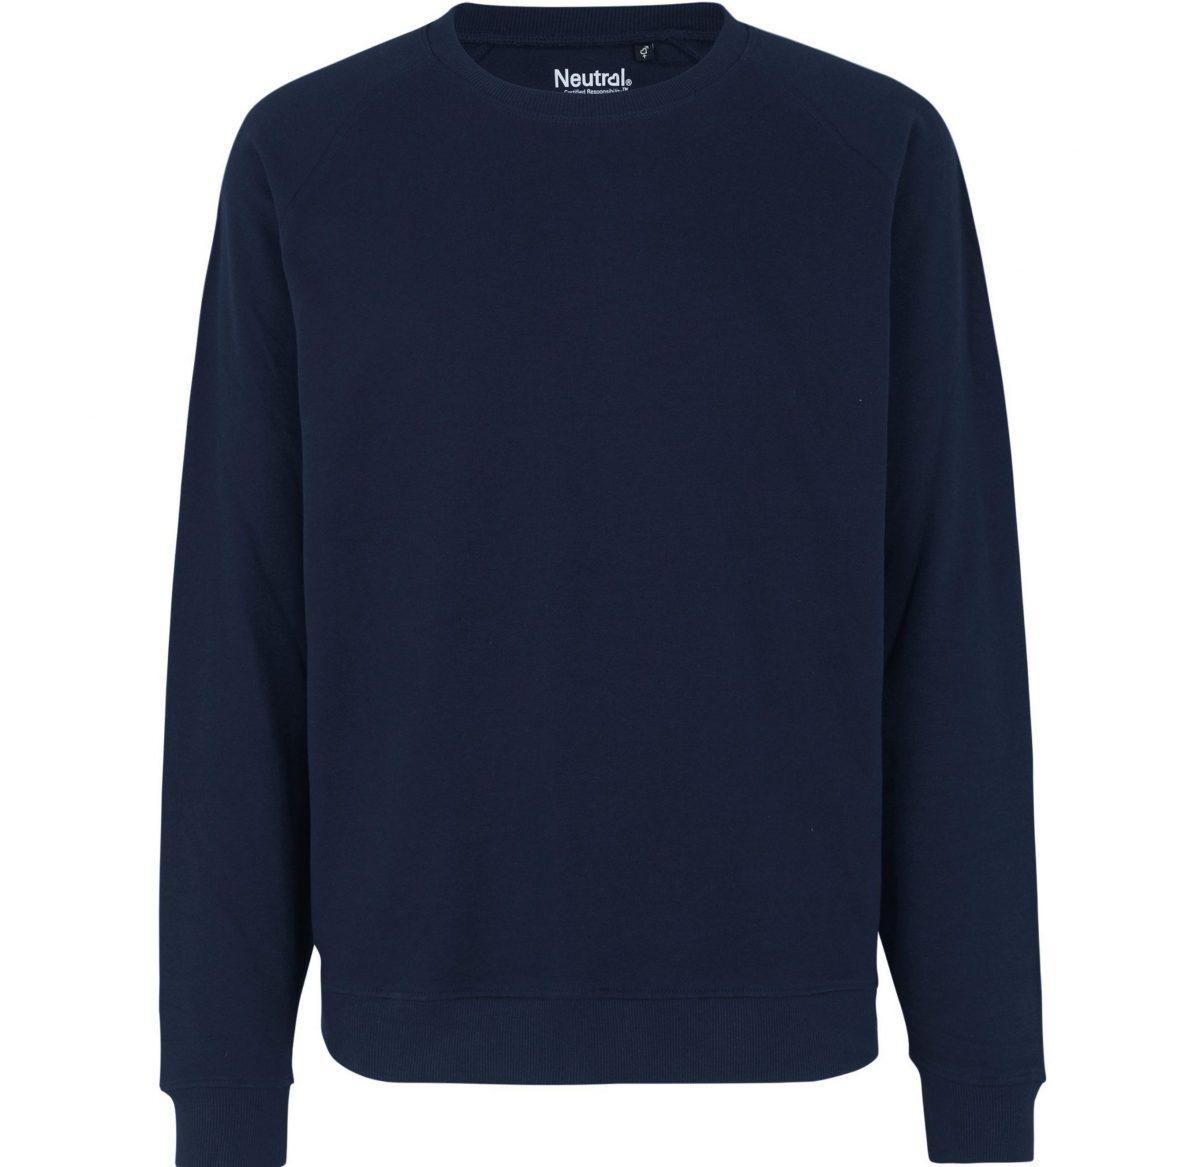 Sweatshirt Unisexe - Bleu marine